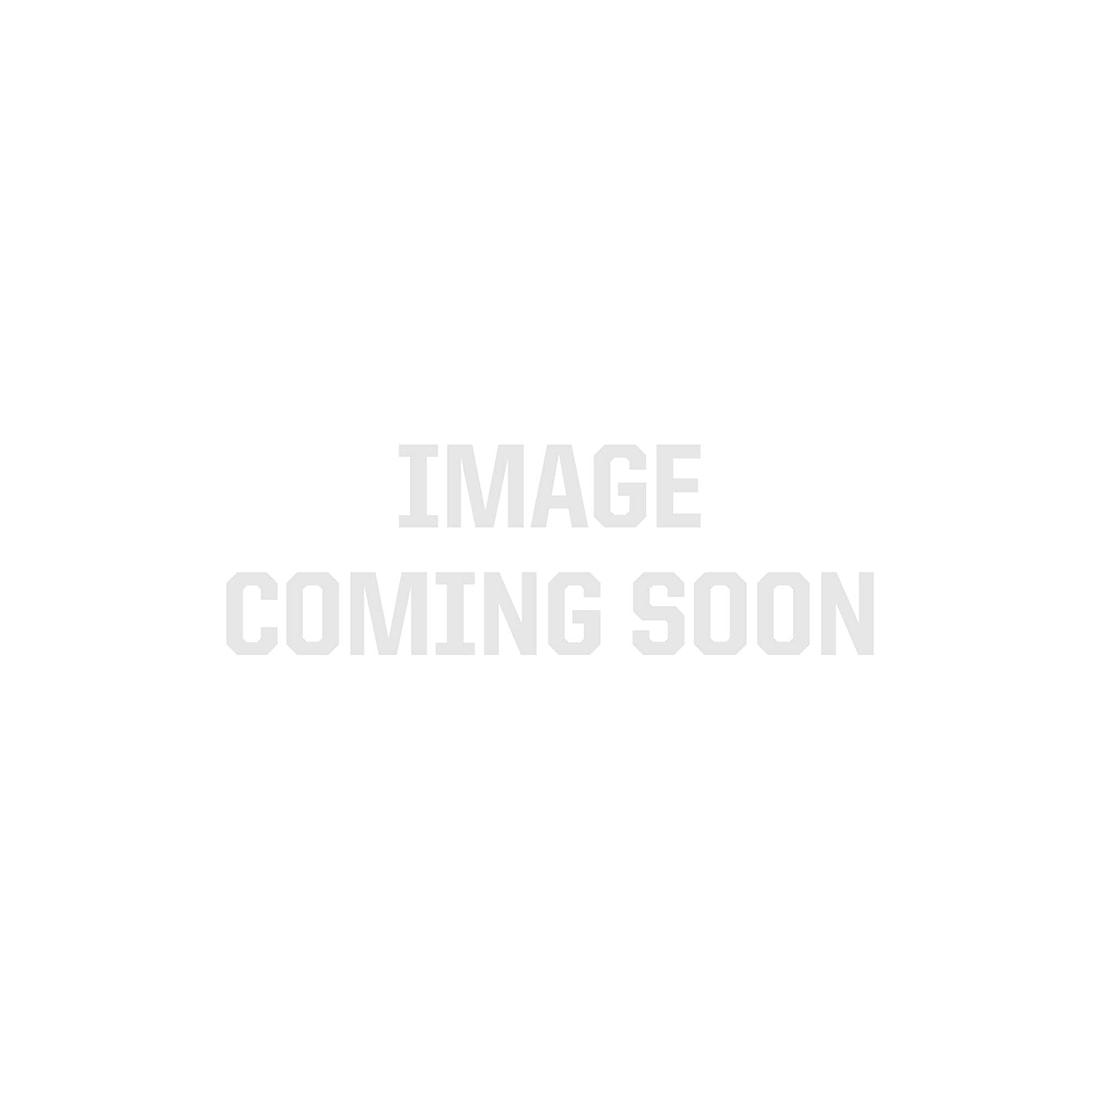 TruColor 2835 CurrentControl LED Strip Light - 6,500K - 160/m - CurrentControl - Sample Kit